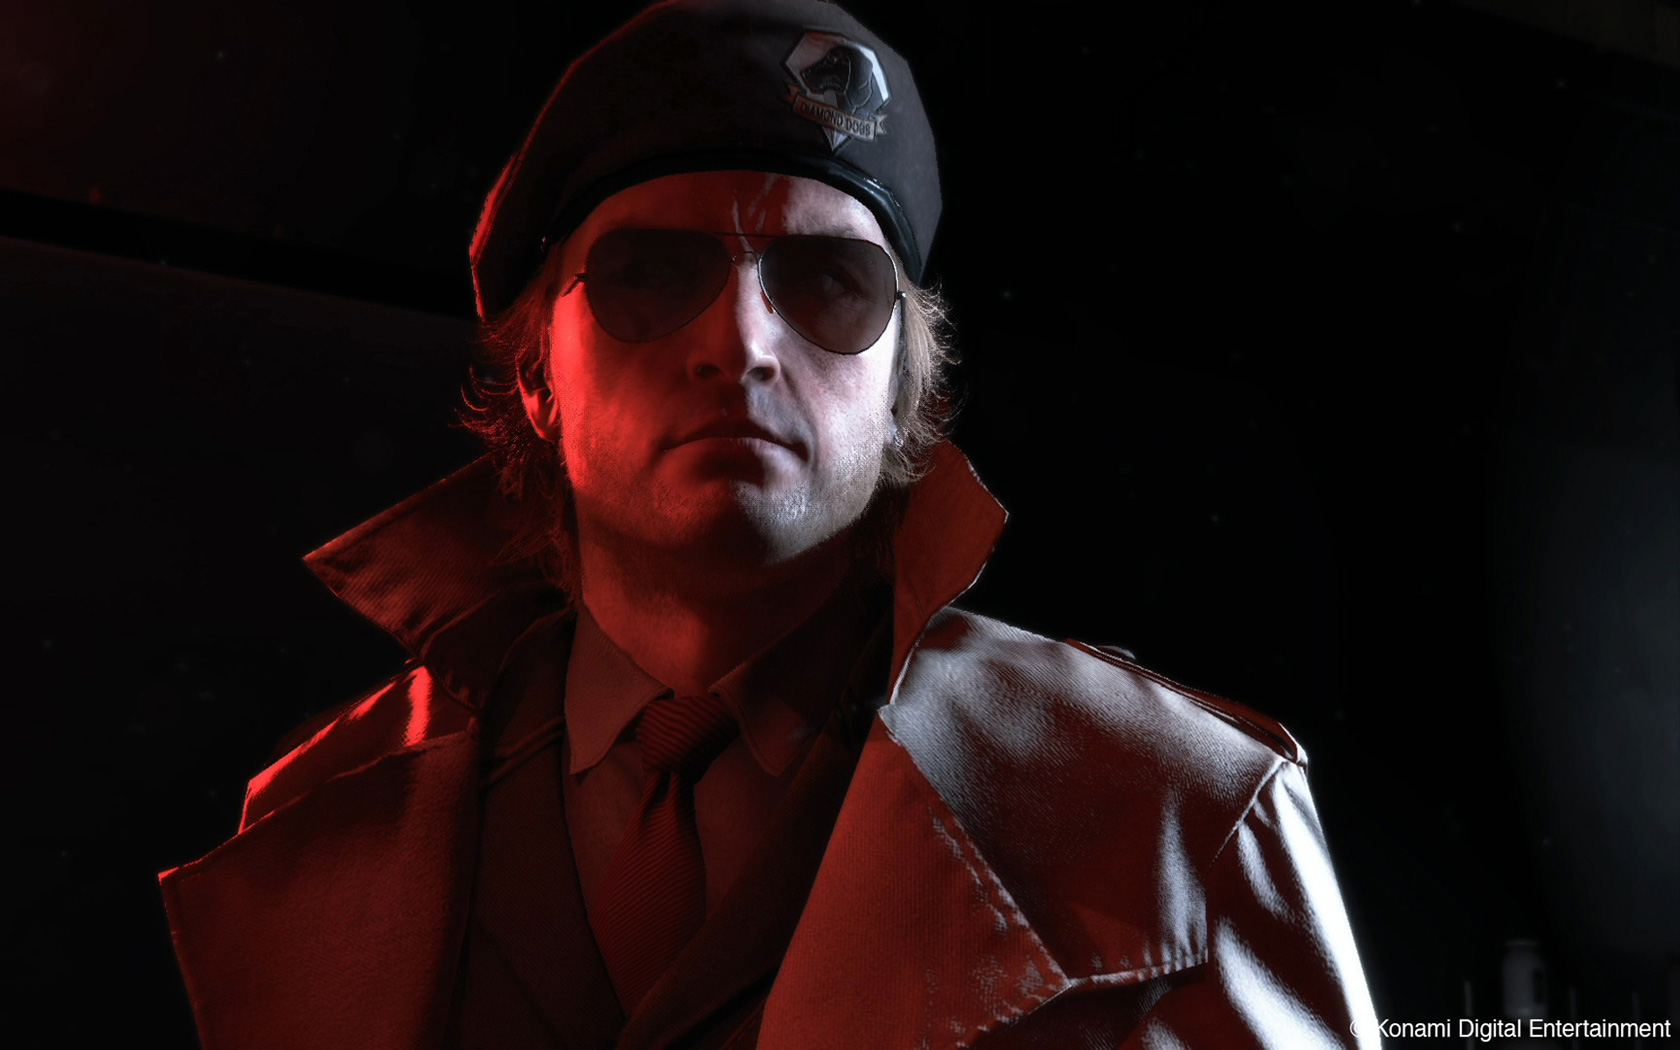 Free Metal Gear Solid V: The Phantom Pain Wallpaper in 1680x1050